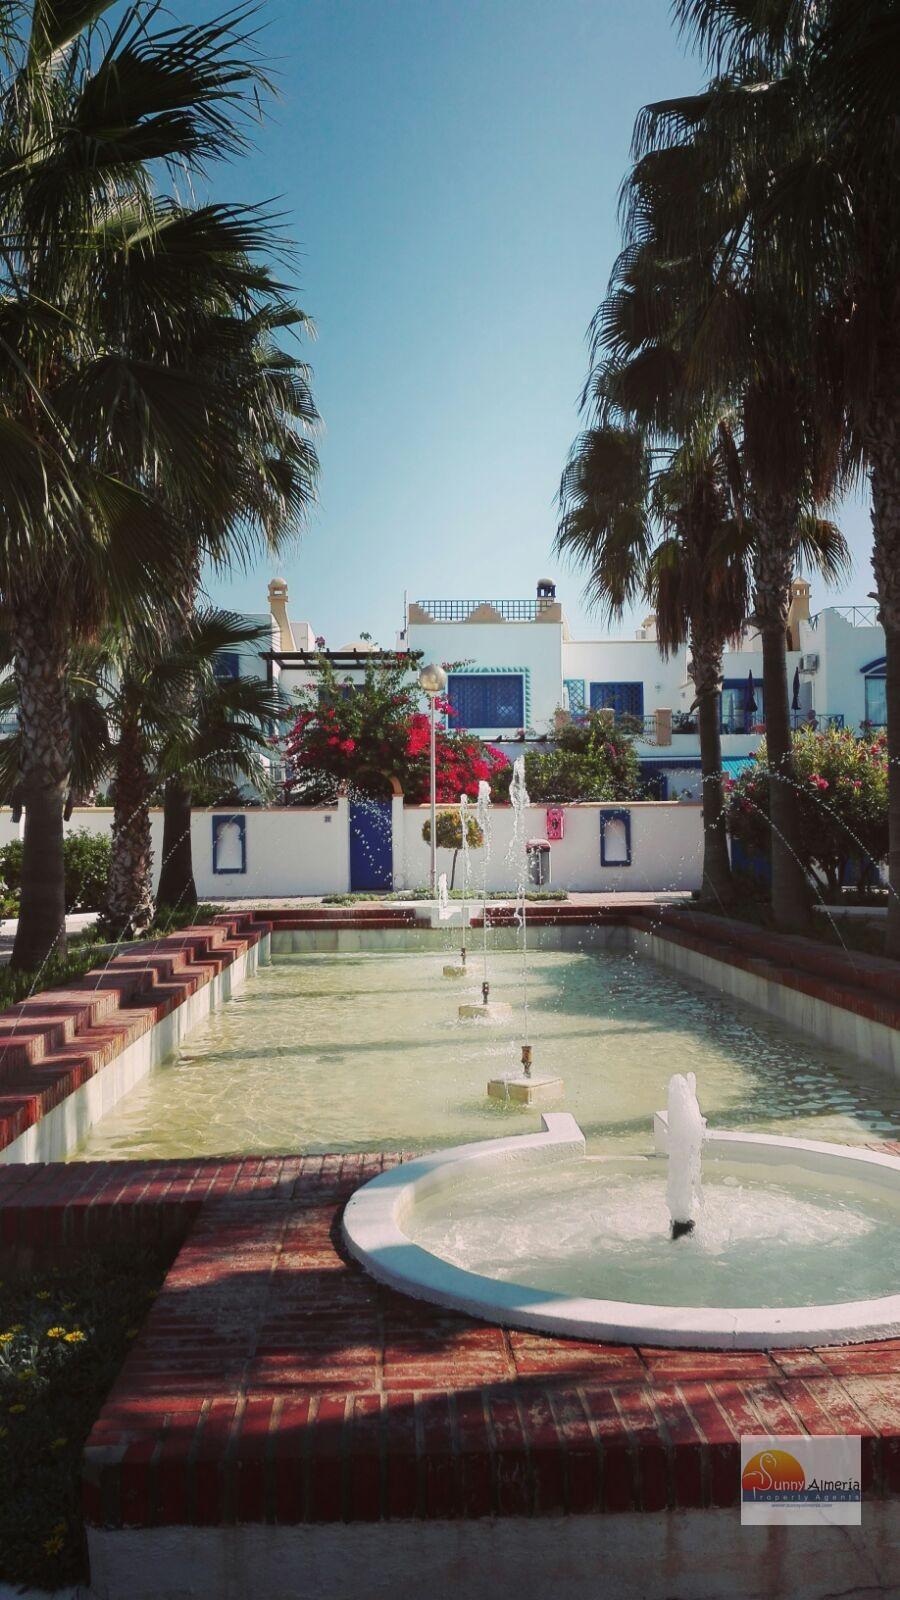 Apartment for rent in Avenida Entremares 8-12 (Roquetas de Mar), 500 €/month